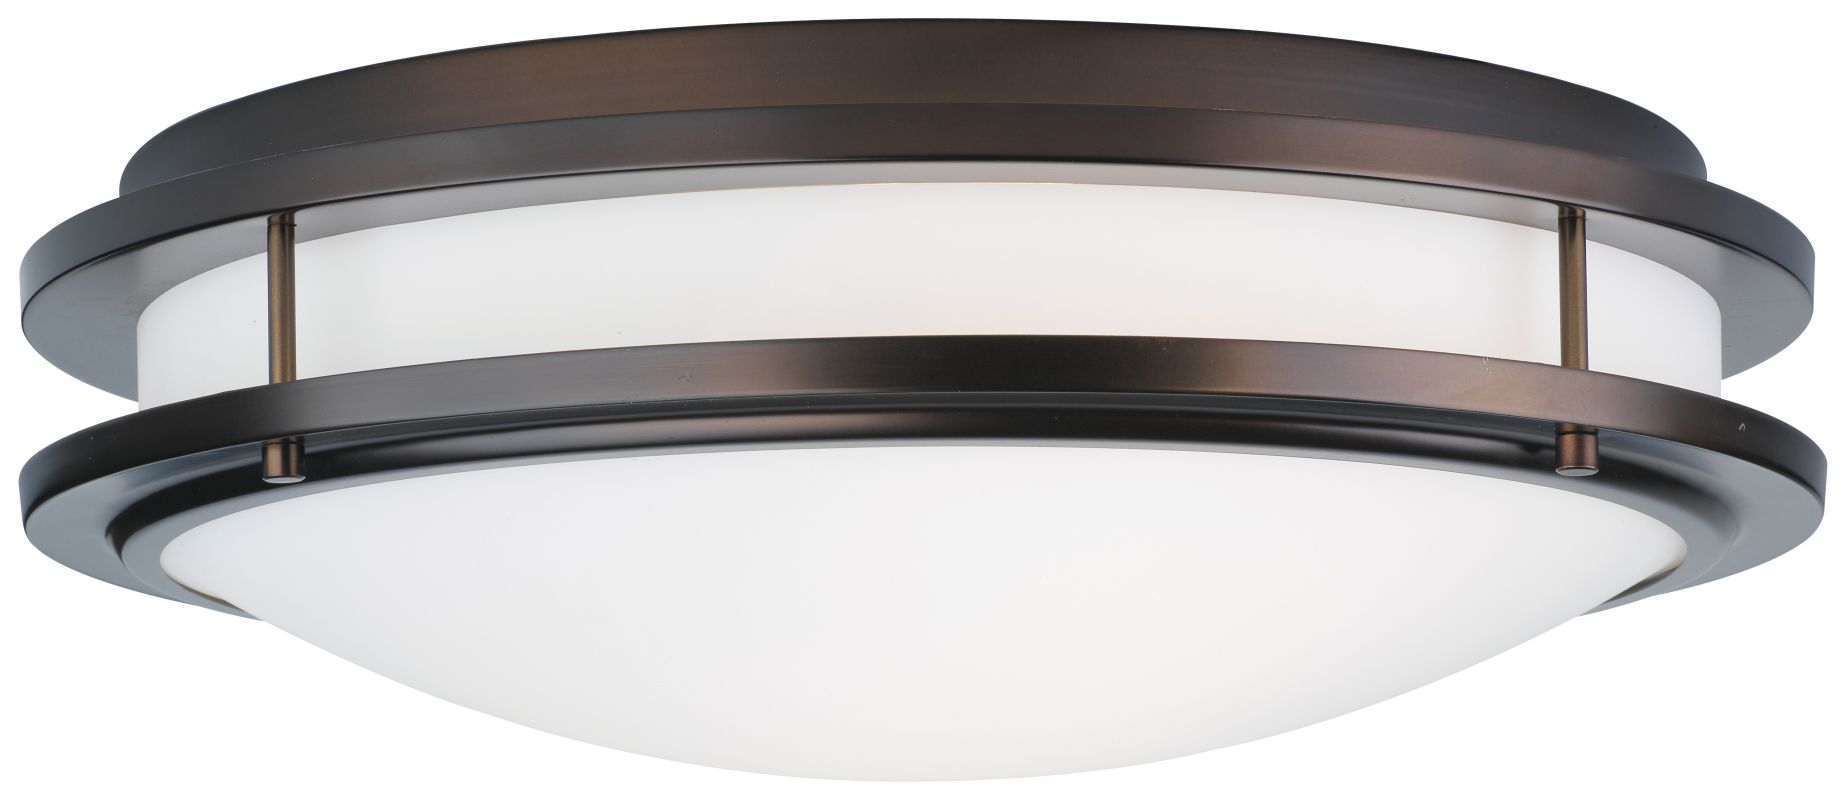 "Forecast Lighting F245770U 2 Light 18"" Wide Flush Mount Ceiling Sale $154.80 ITEM: bci2747920 ID#:F245770U UPC: 742546090076 :"